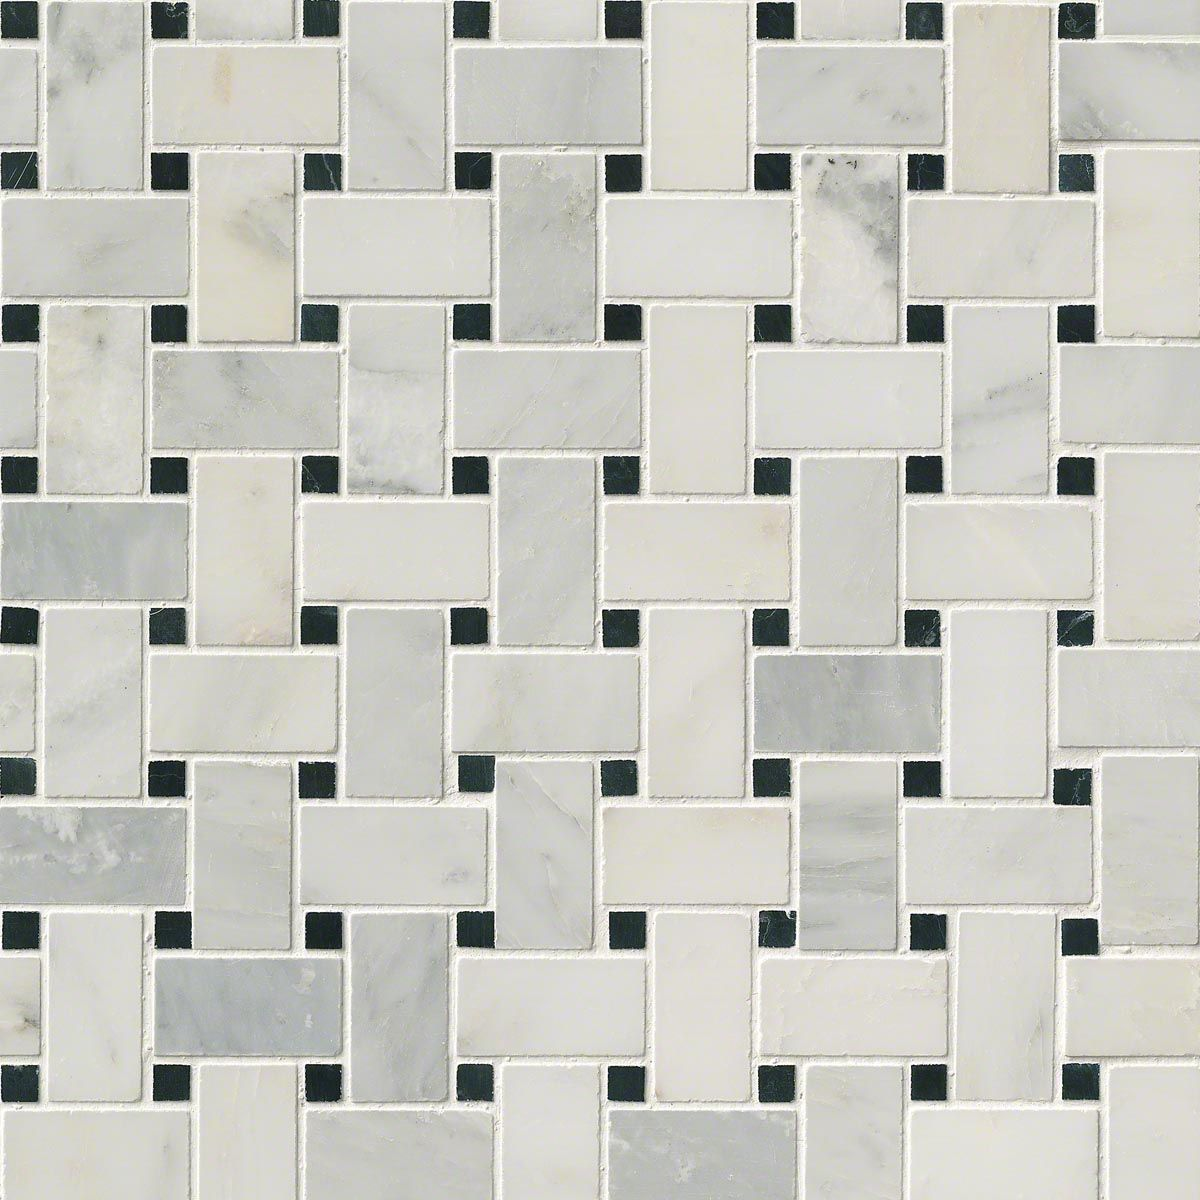 Arabescato Carrara With Black Marble Basket Weave Pattern Honed Tile Mosaics Basket Weave Tile Tiles Marble Mosaic Tiles